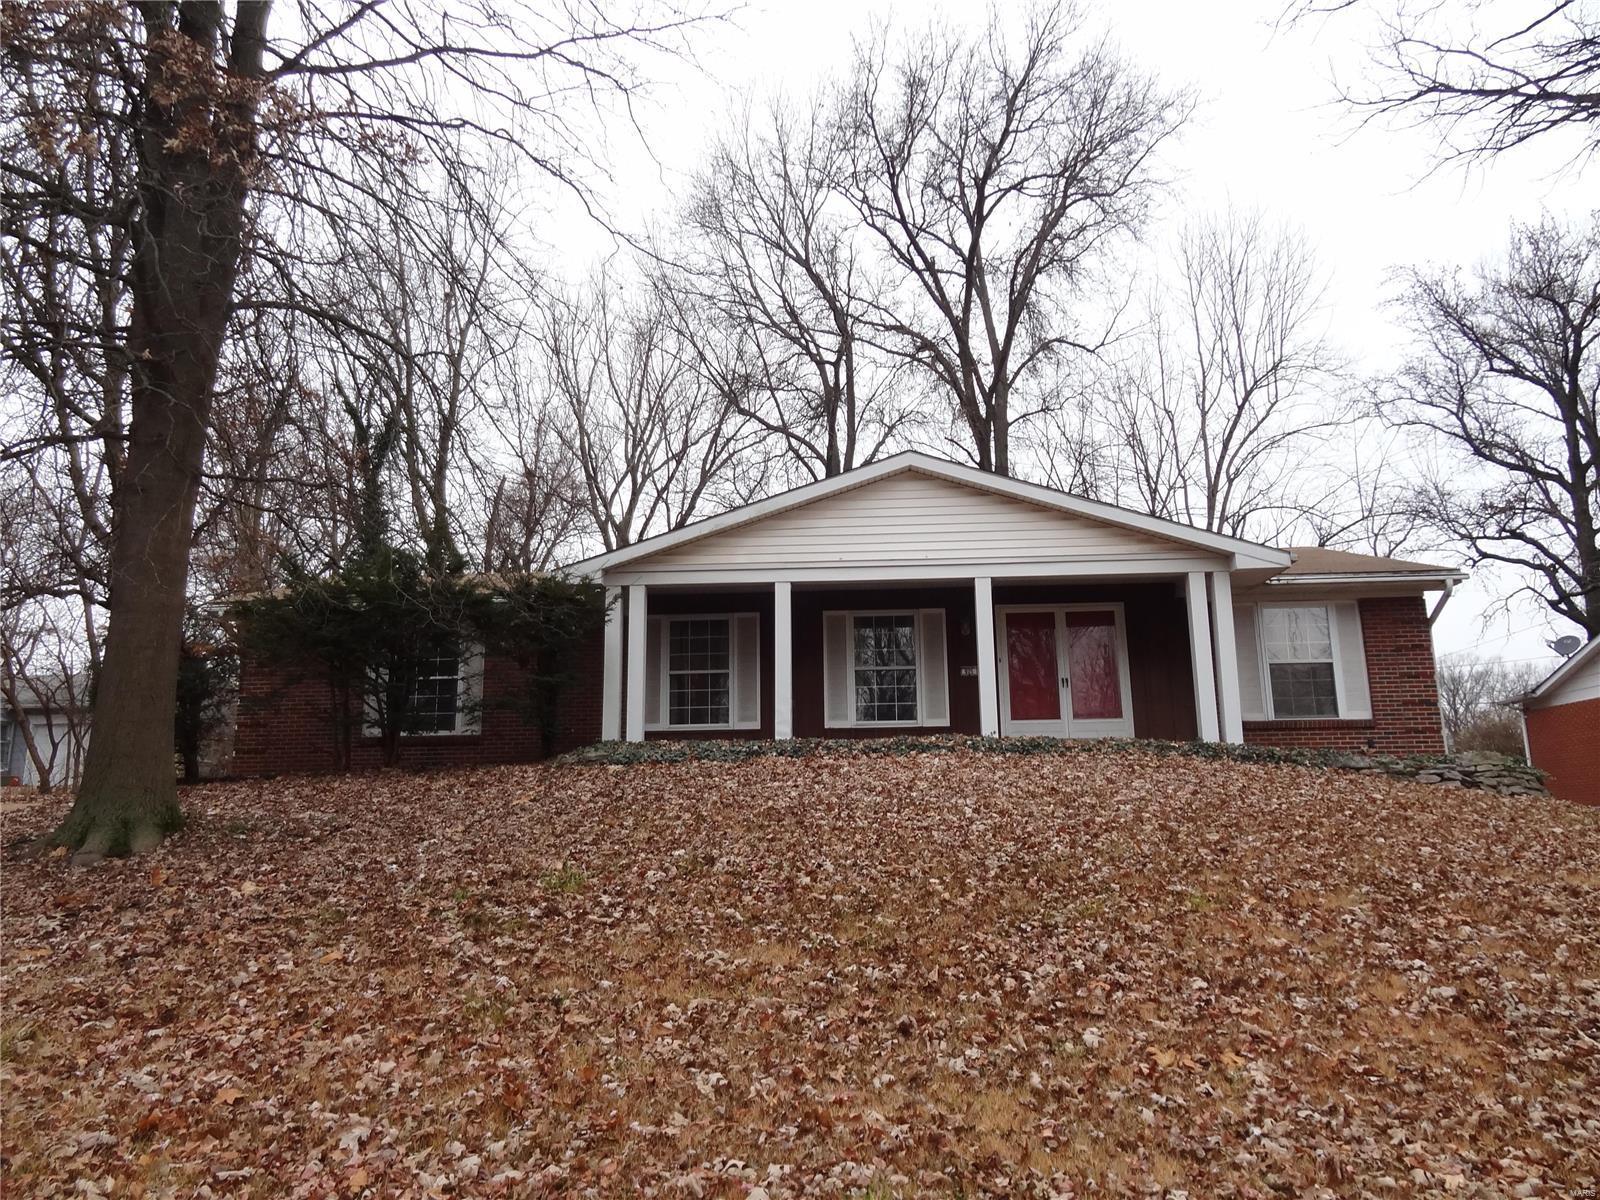 925 Roussilon Property Photo - St Louis, MO real estate listing